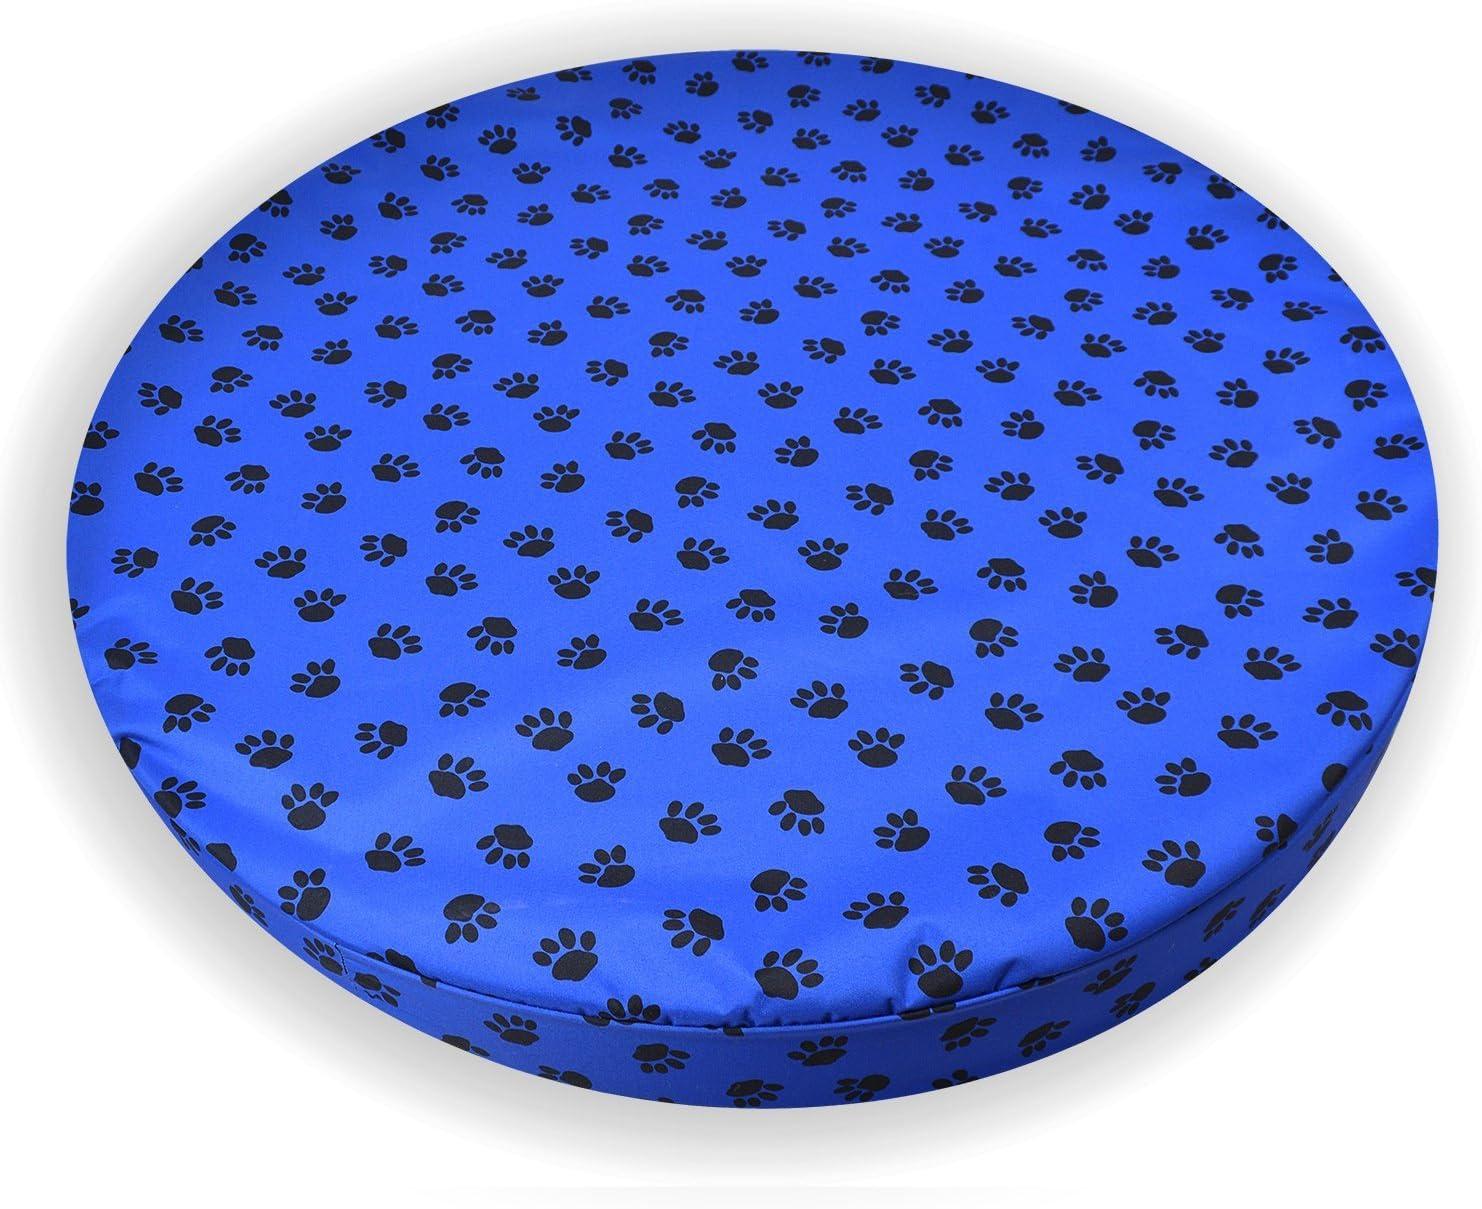 Paws - Pet Beds Direct Azul Patas–ortopédica de Espuma con Efecto Memoria para Perro Impermeable Cama